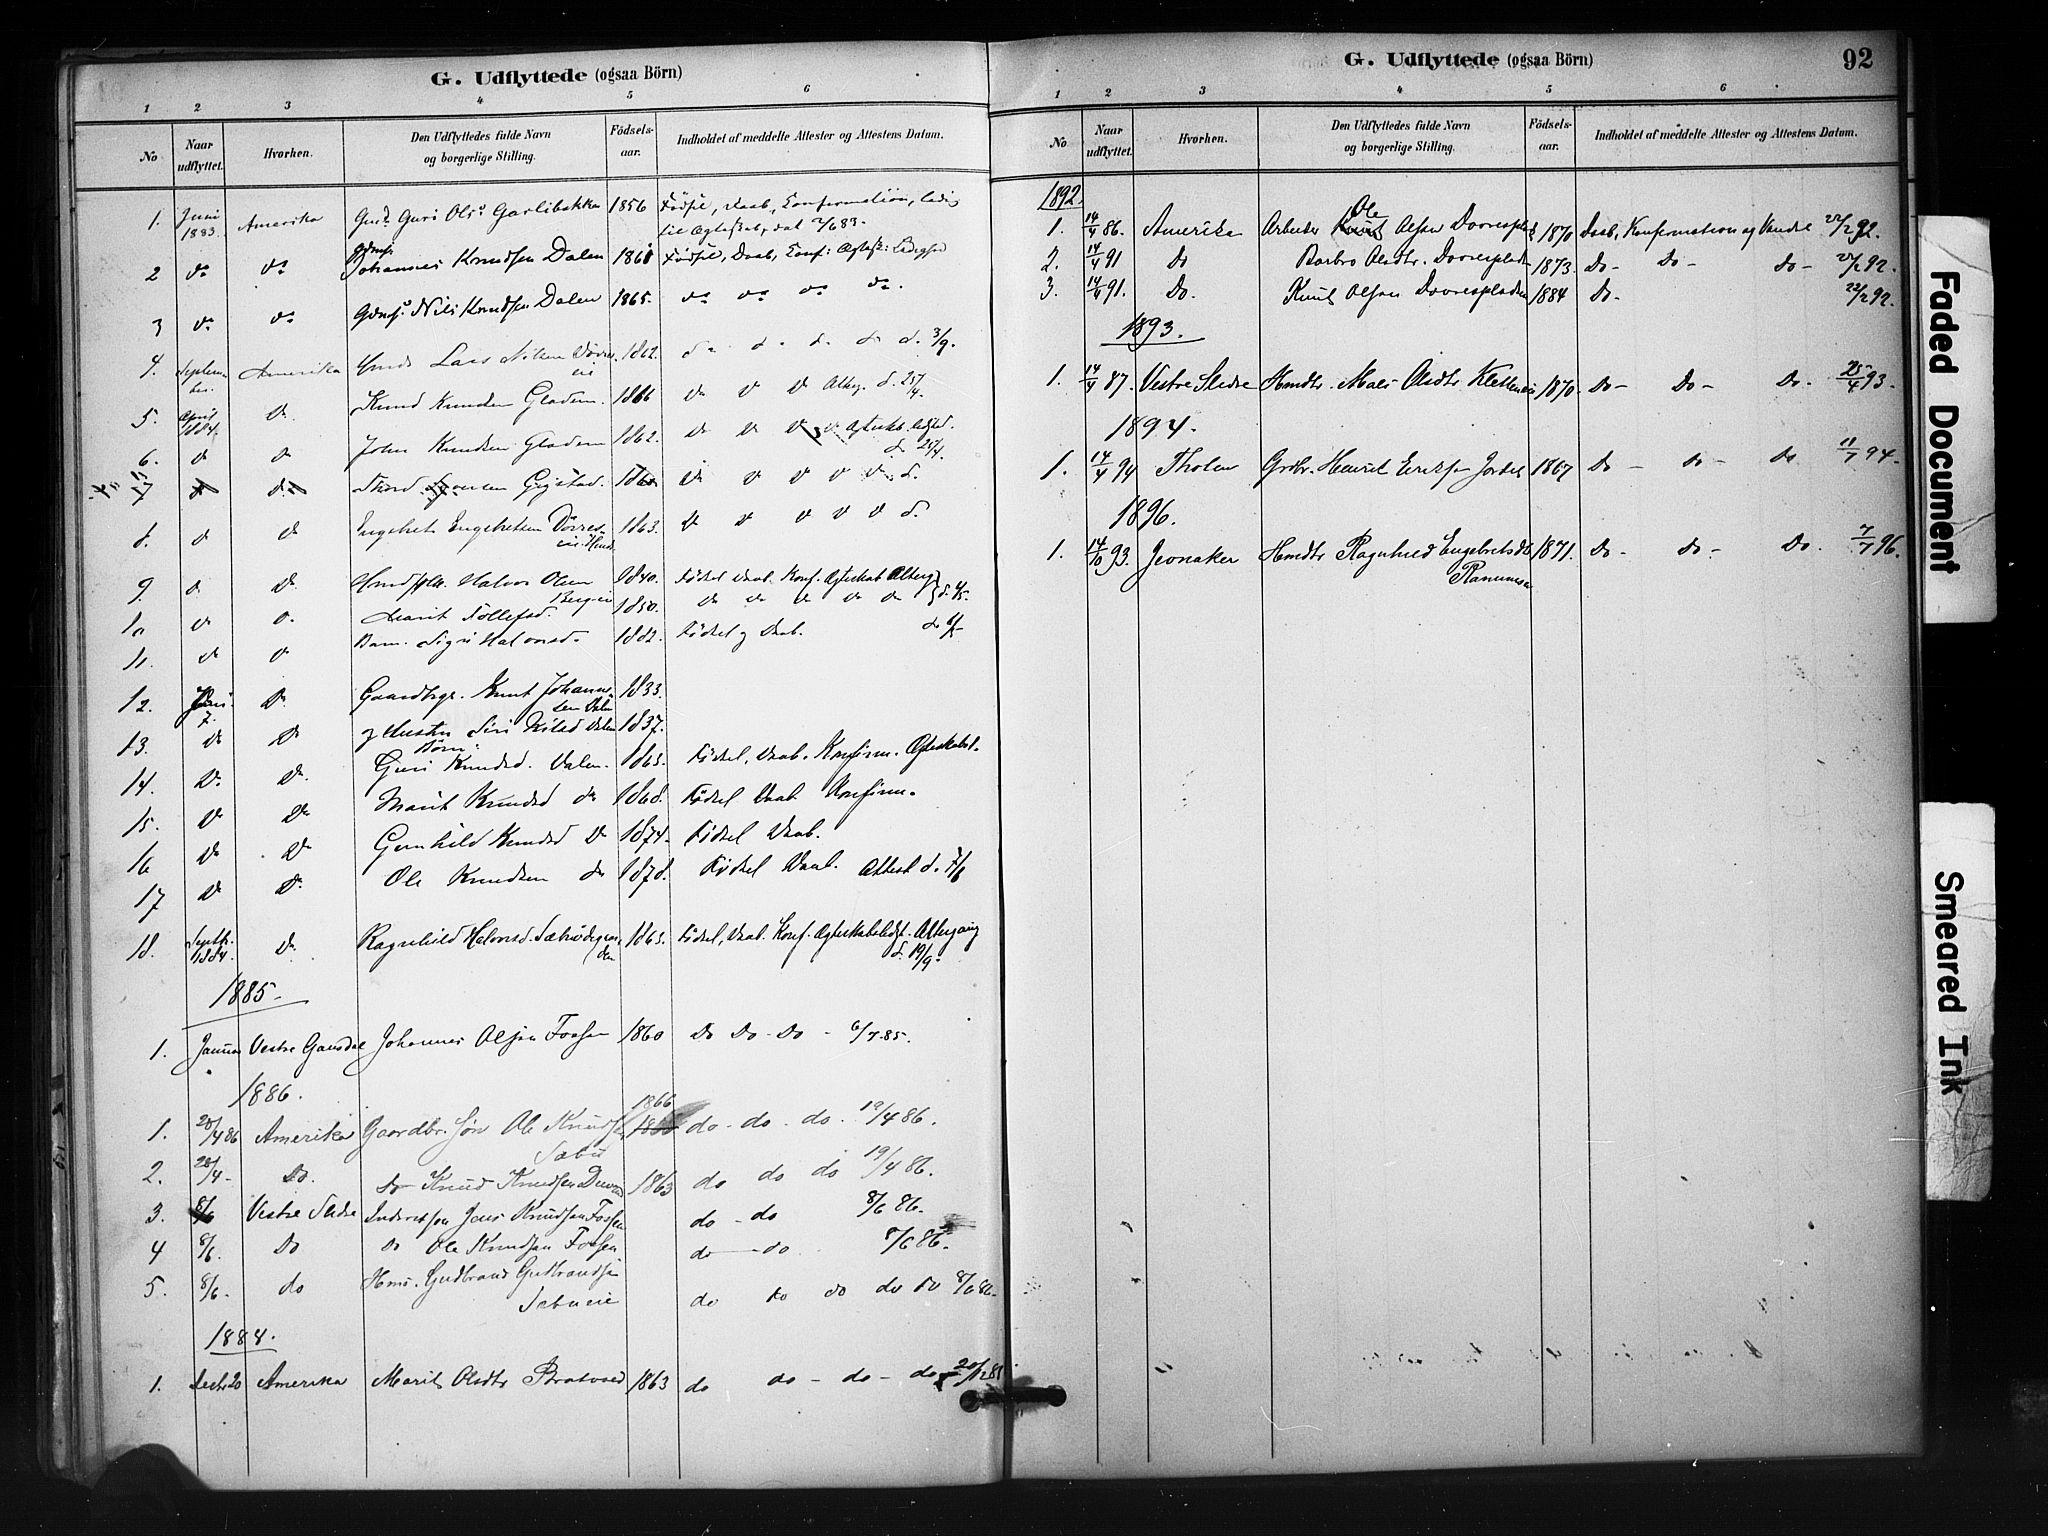 SAH, Nord-Aurdal prestekontor, Ministerialbok nr. 12, 1883-1895, s. 92